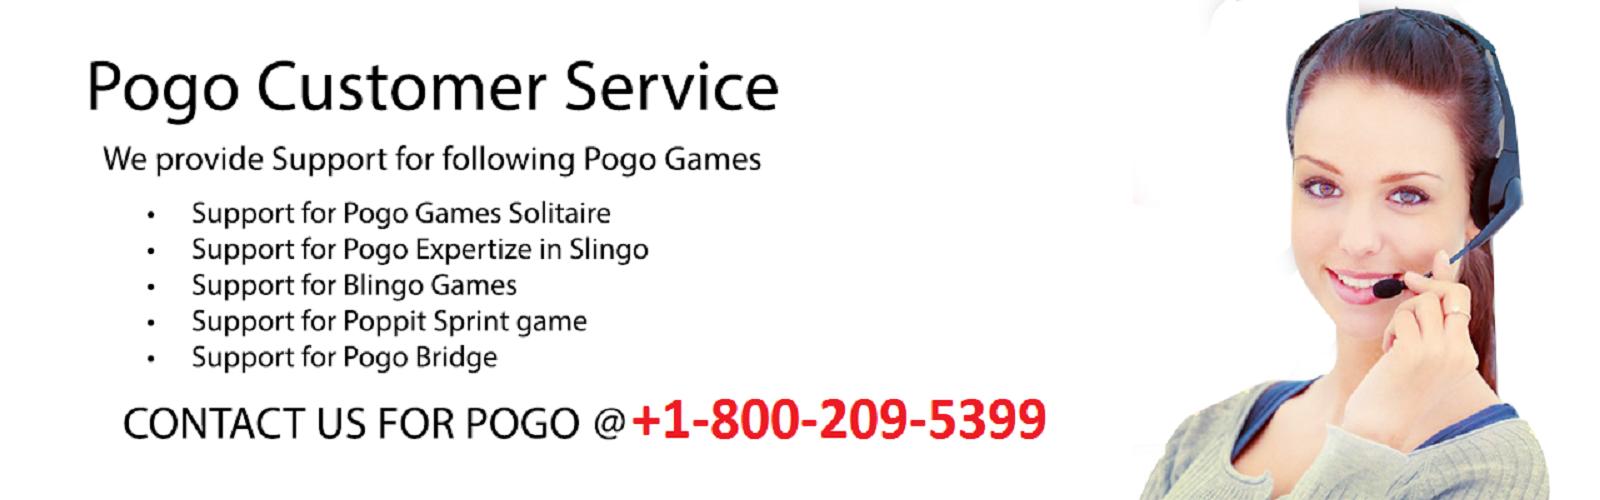 Pogo Game Support Number